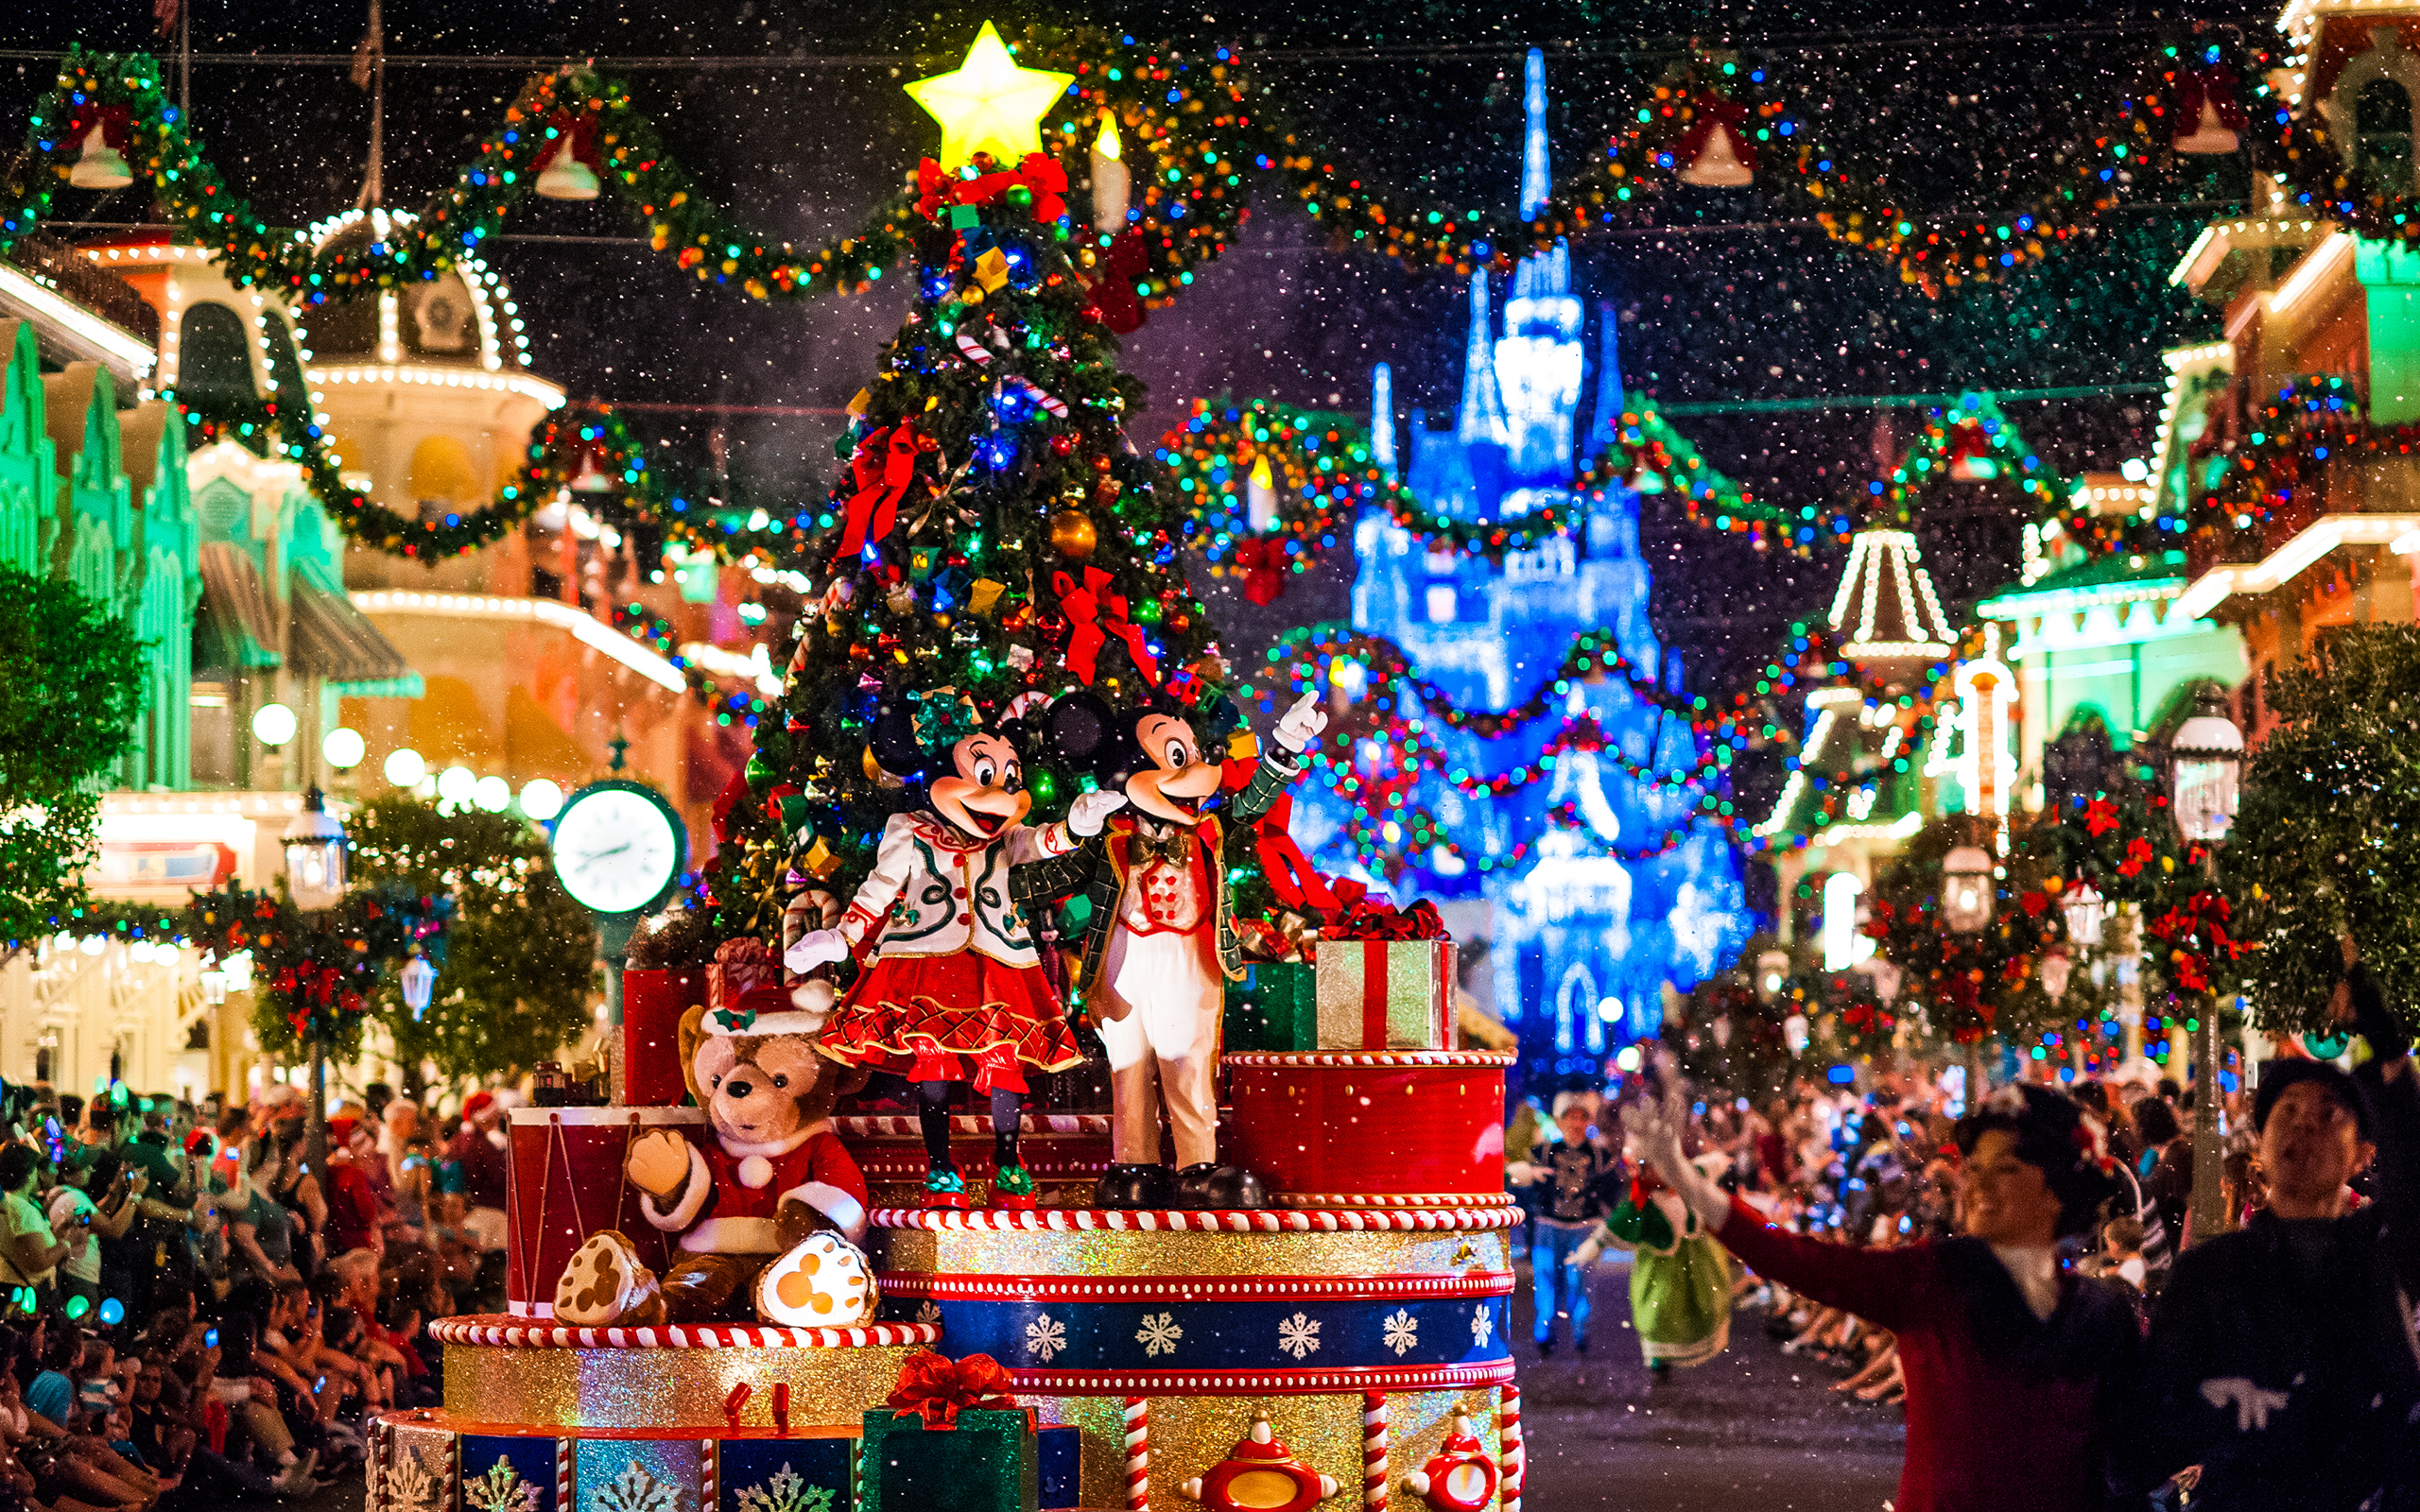 Christmas parade at Walt Disney World Resort, Florida